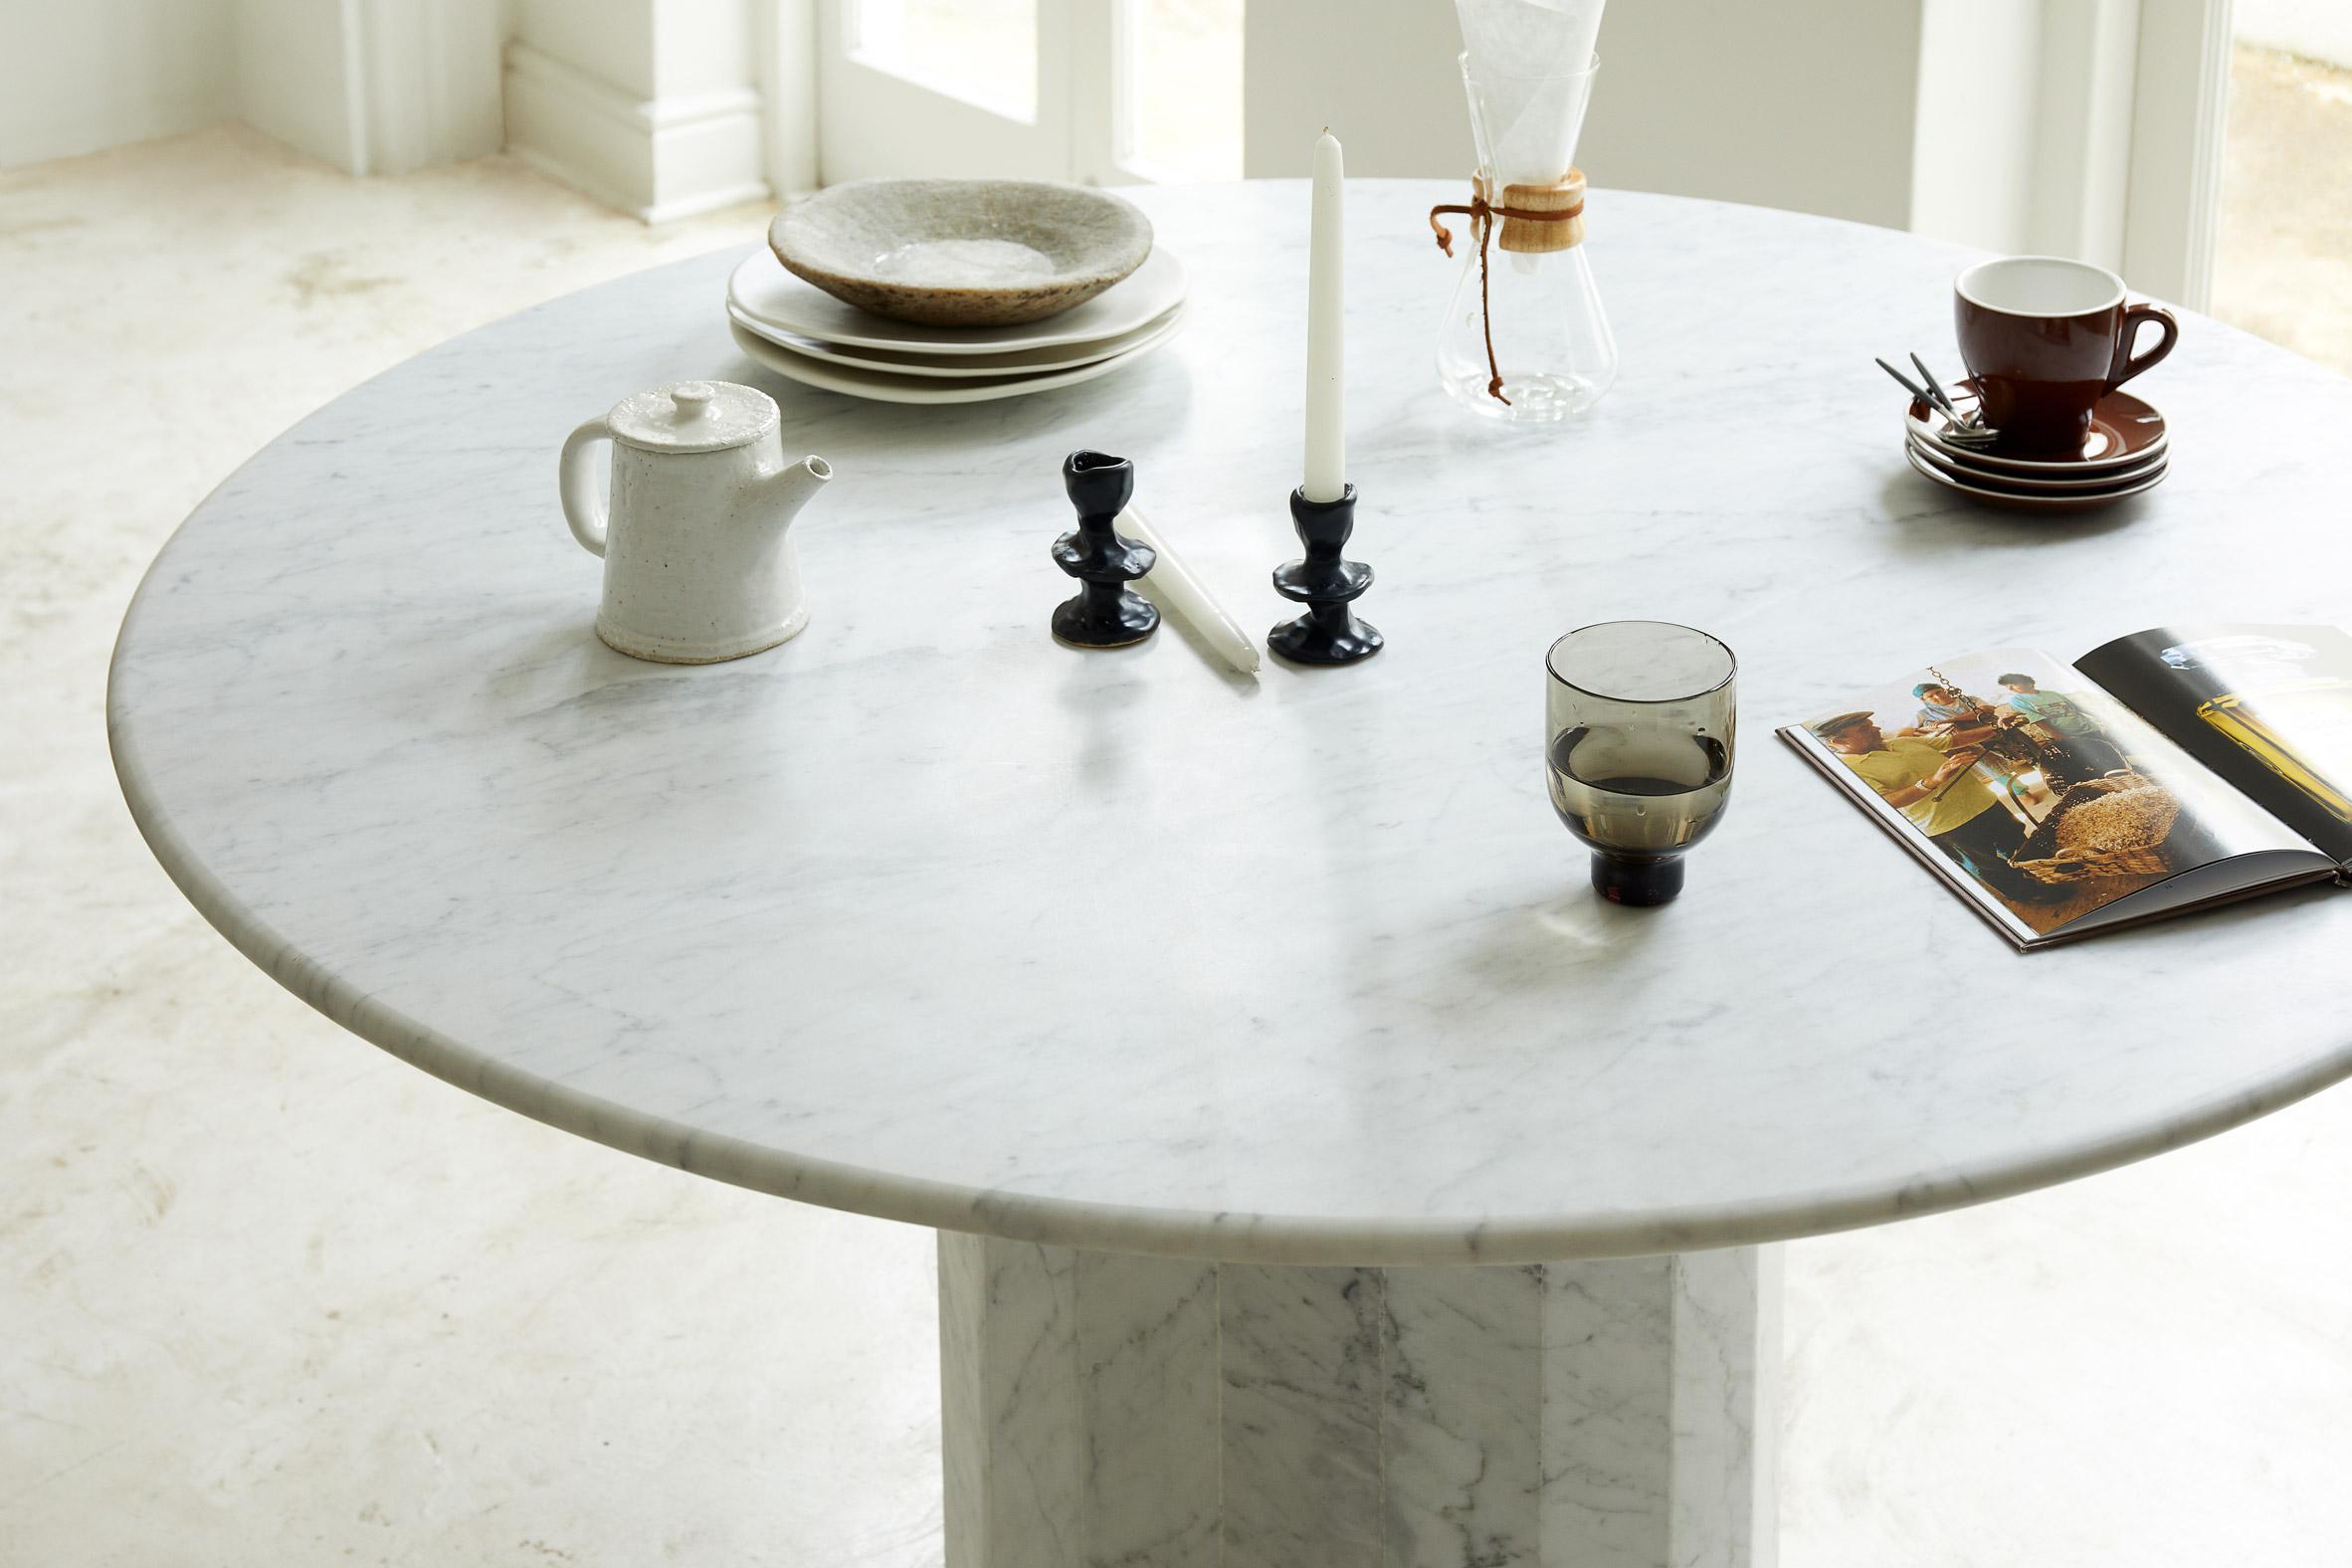 Ashby table by Lemon